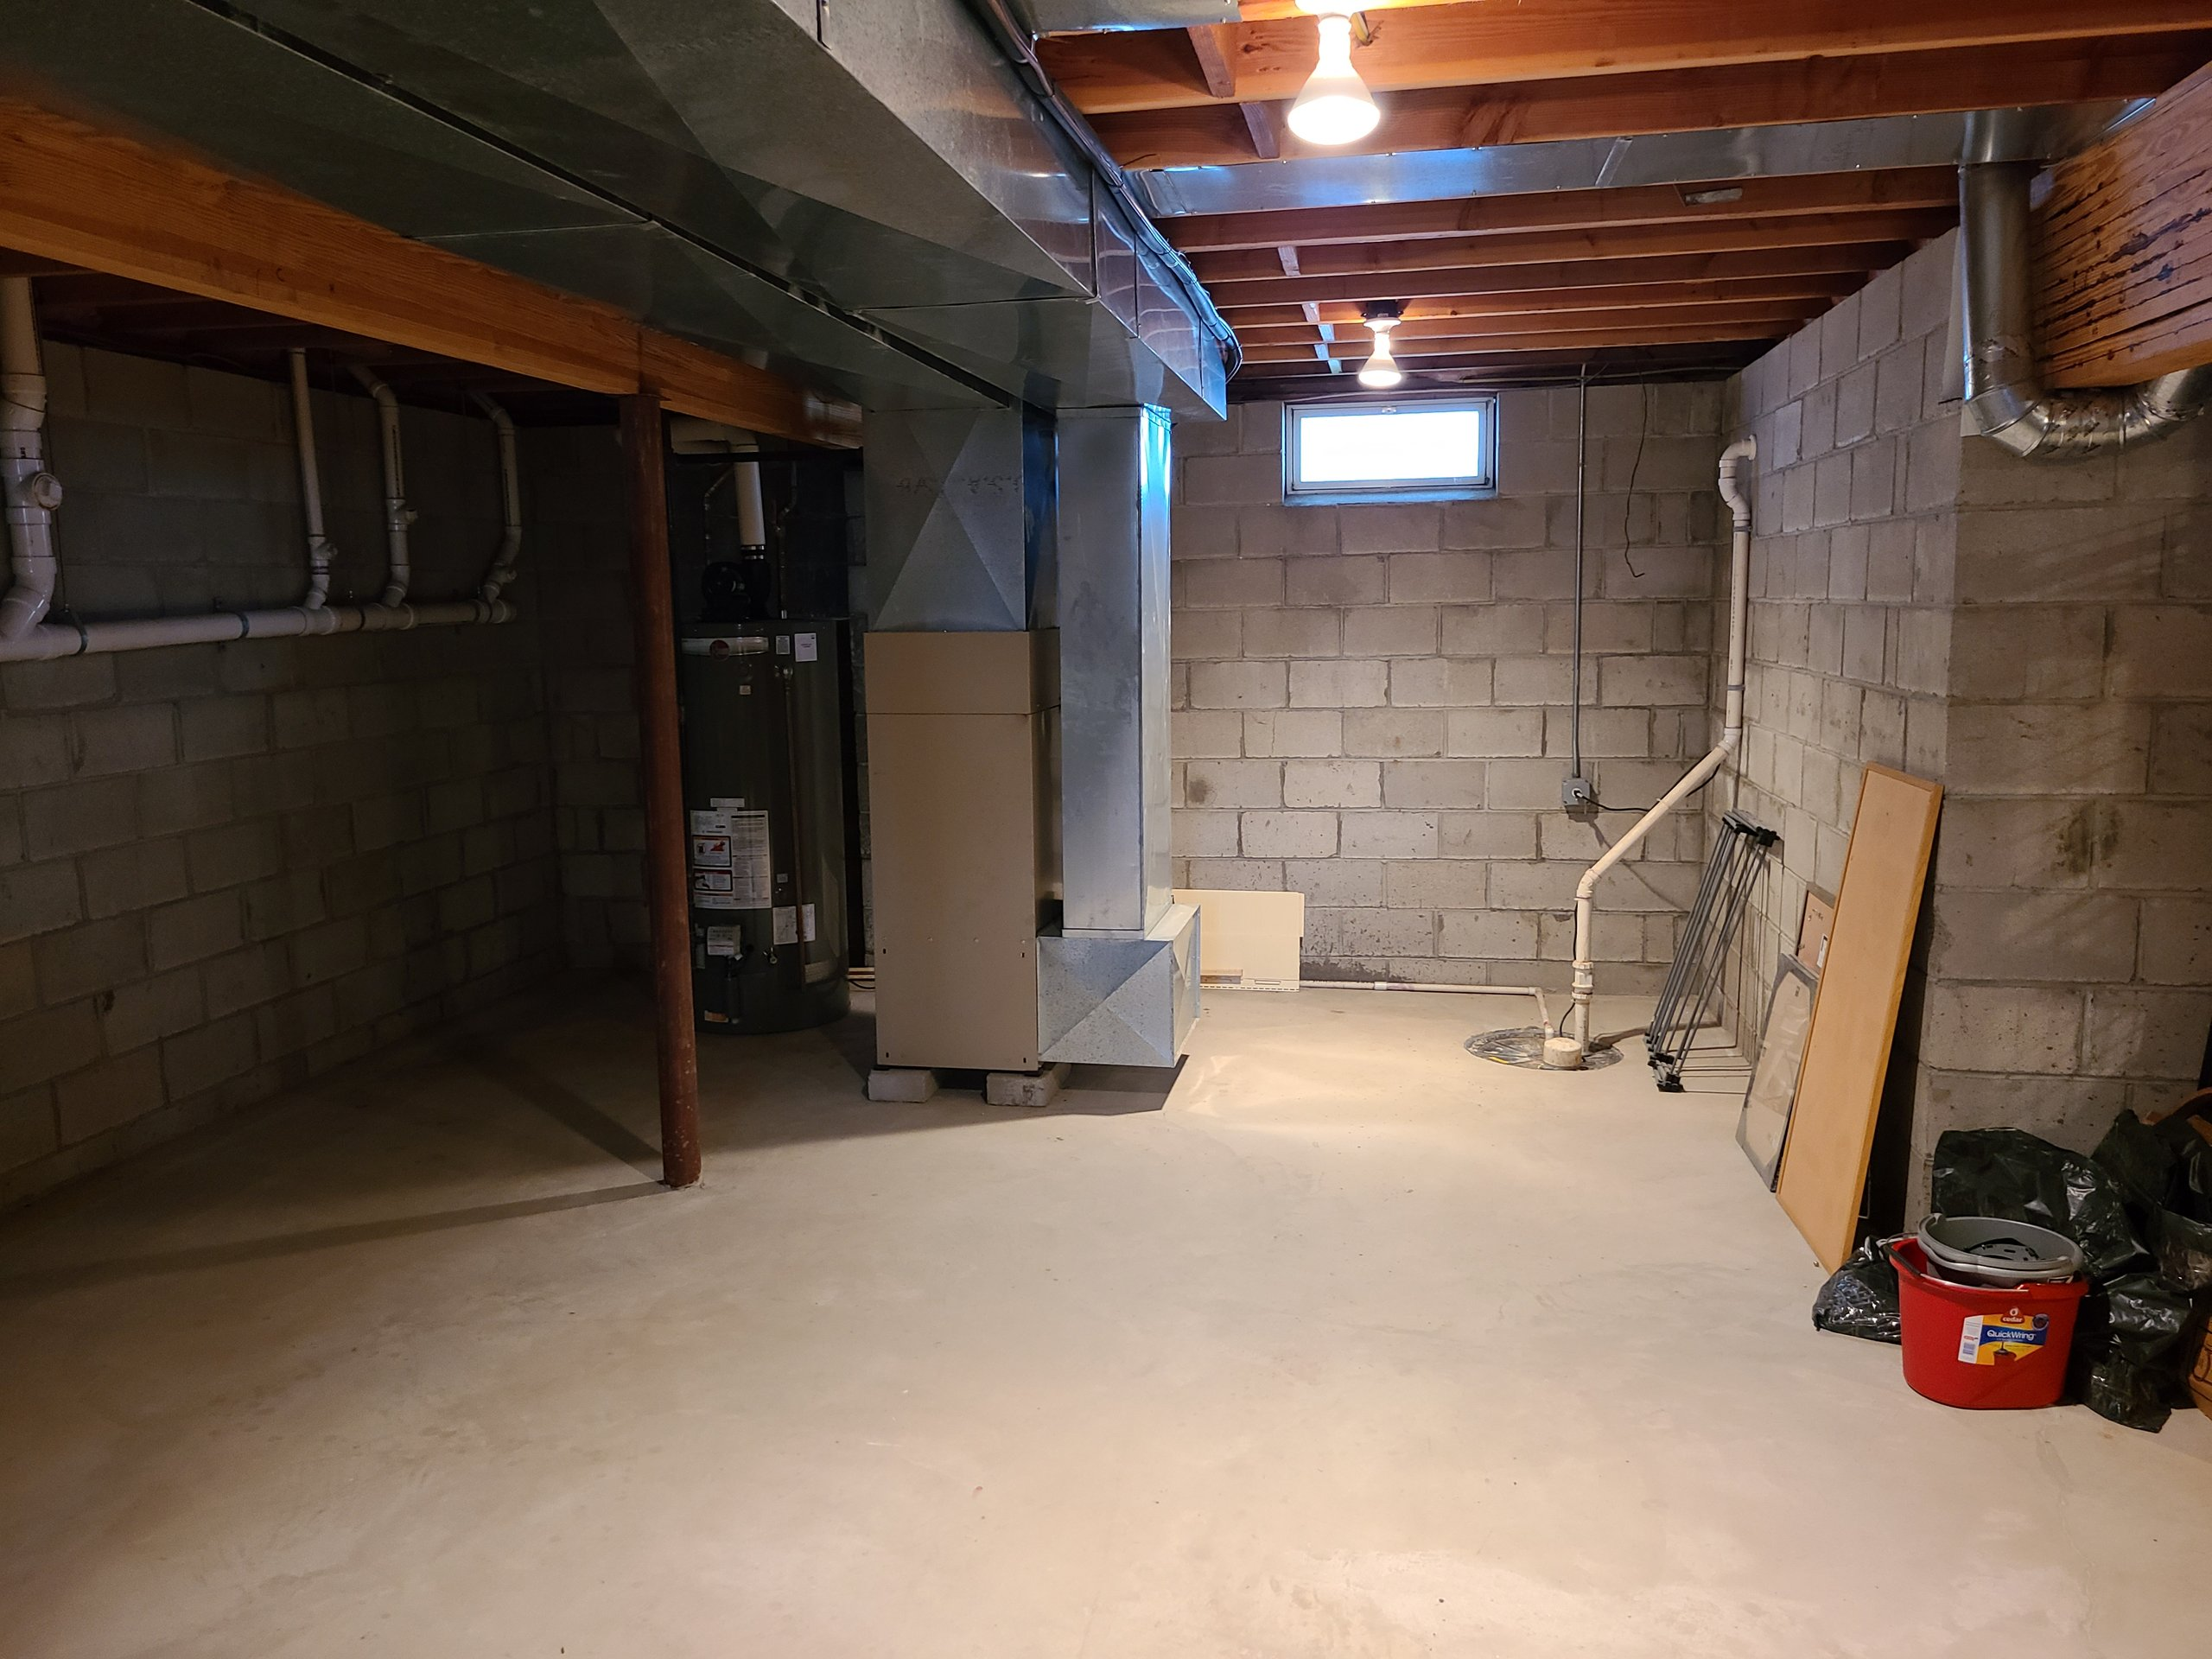 10x16 Basement self storage unit